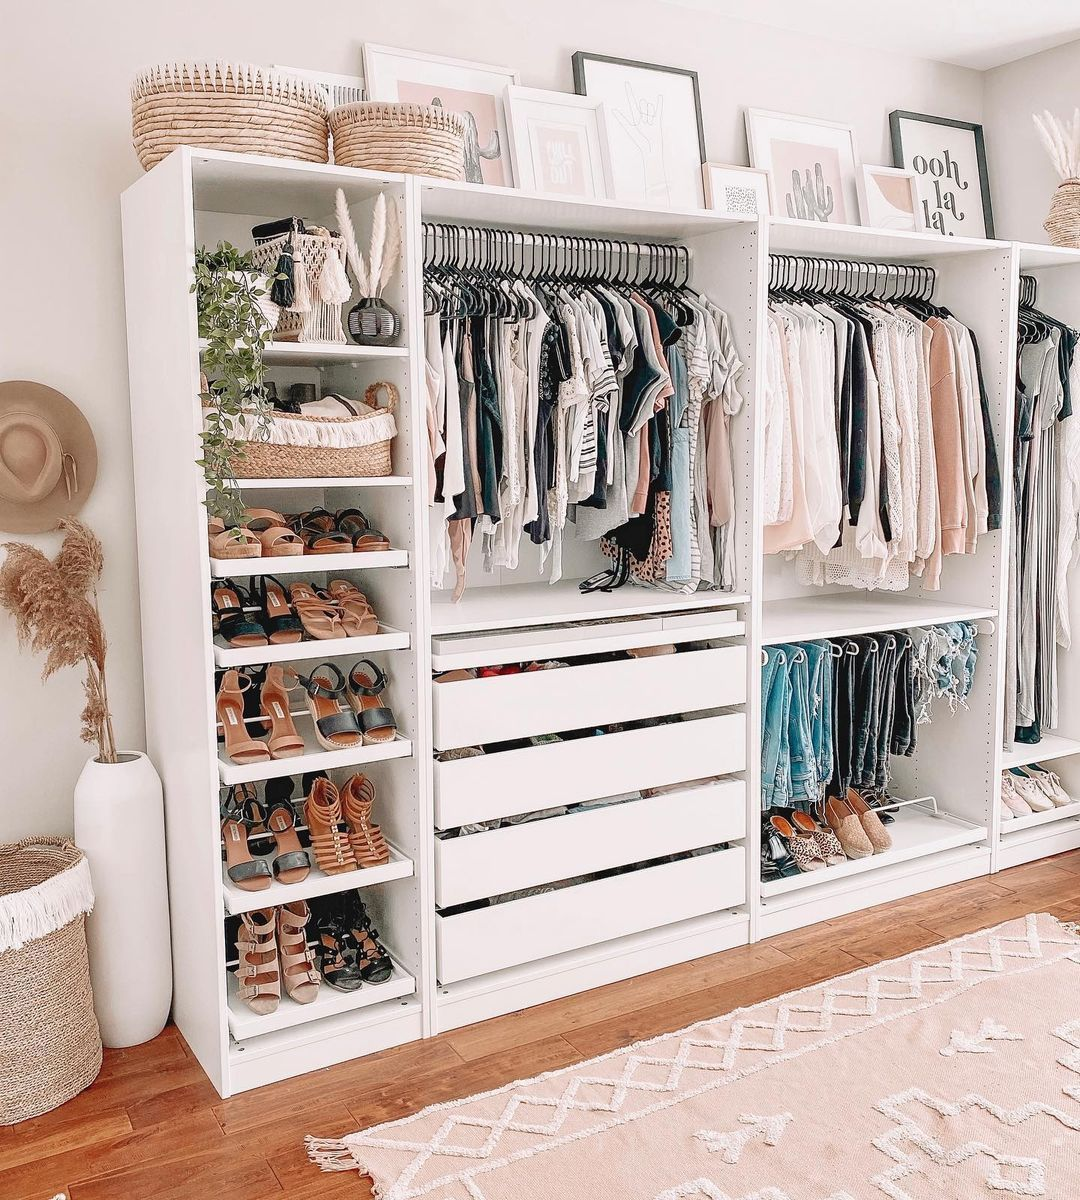 10 Custom Closet Designs to Inspire a Serious Cleanout